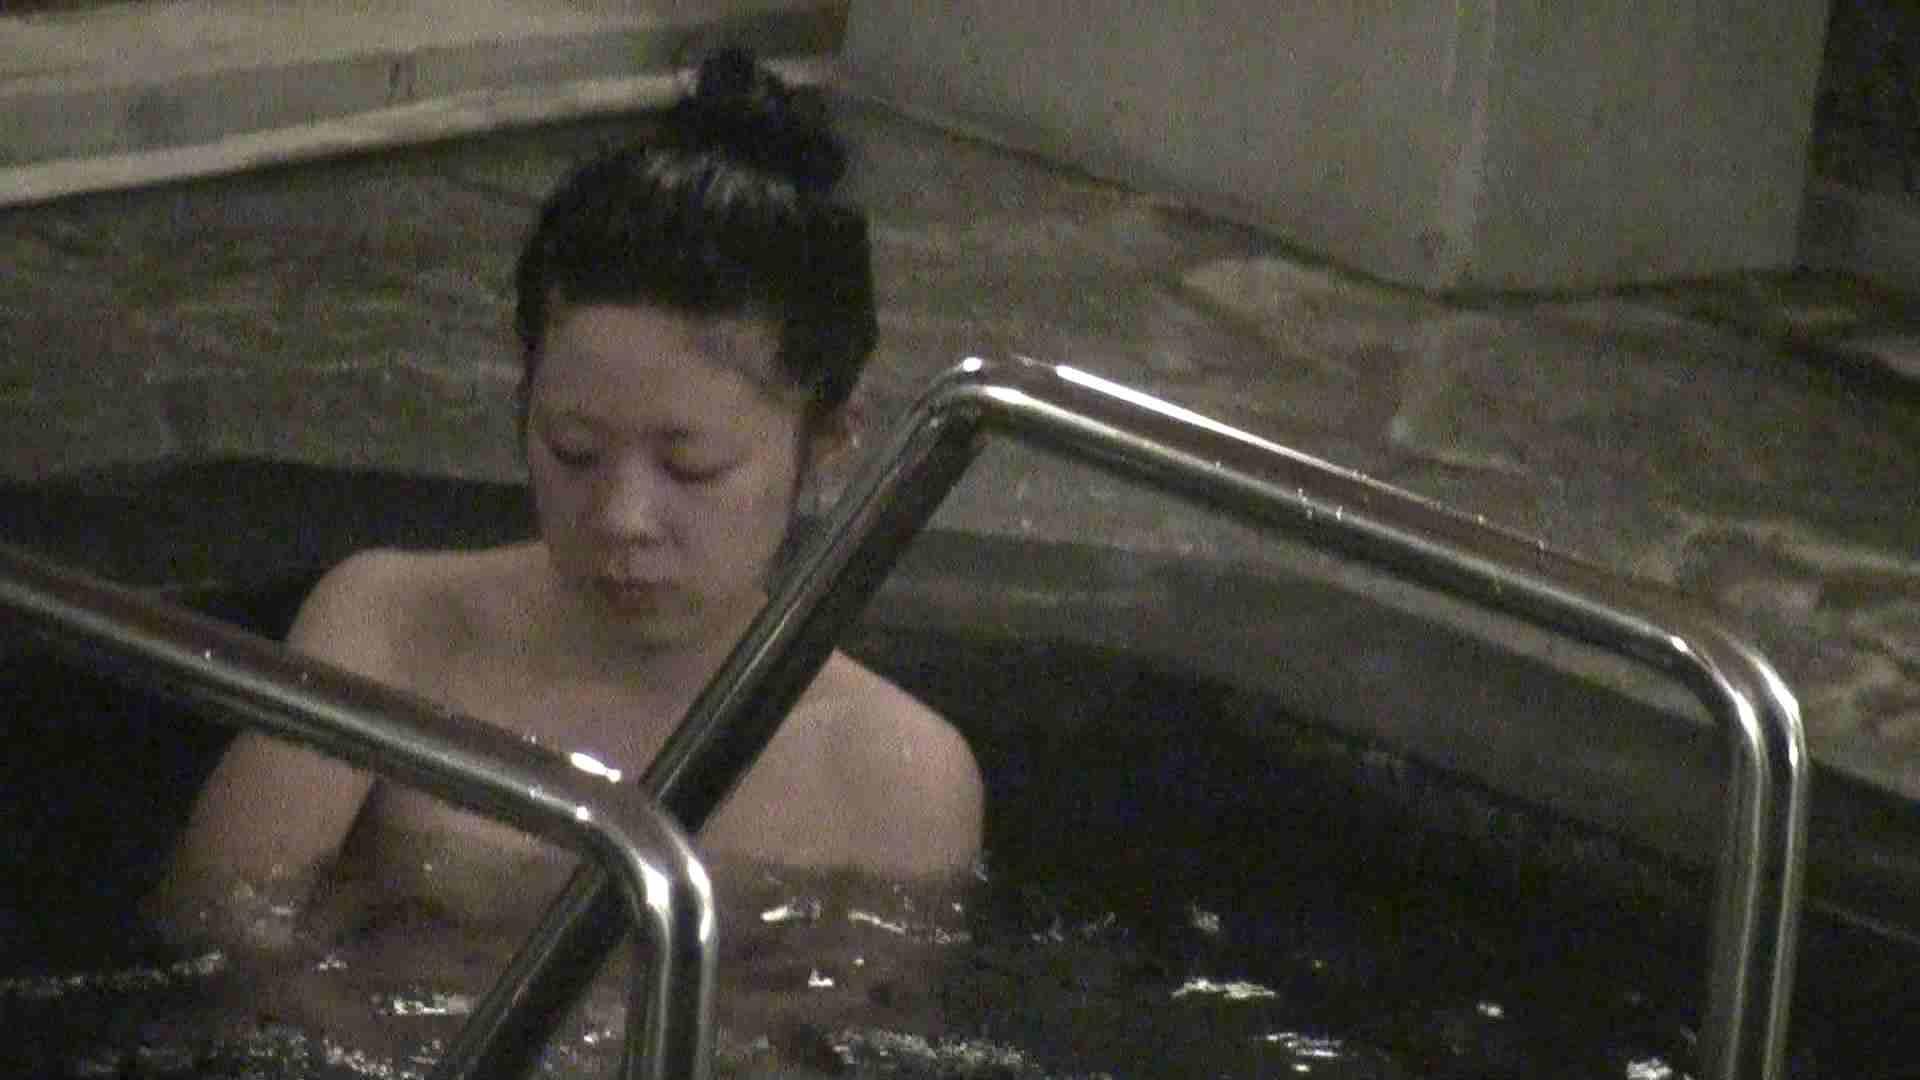 Aquaな露天風呂Vol.314 エッチな盗撮 えろ無修正画像 84pic 48